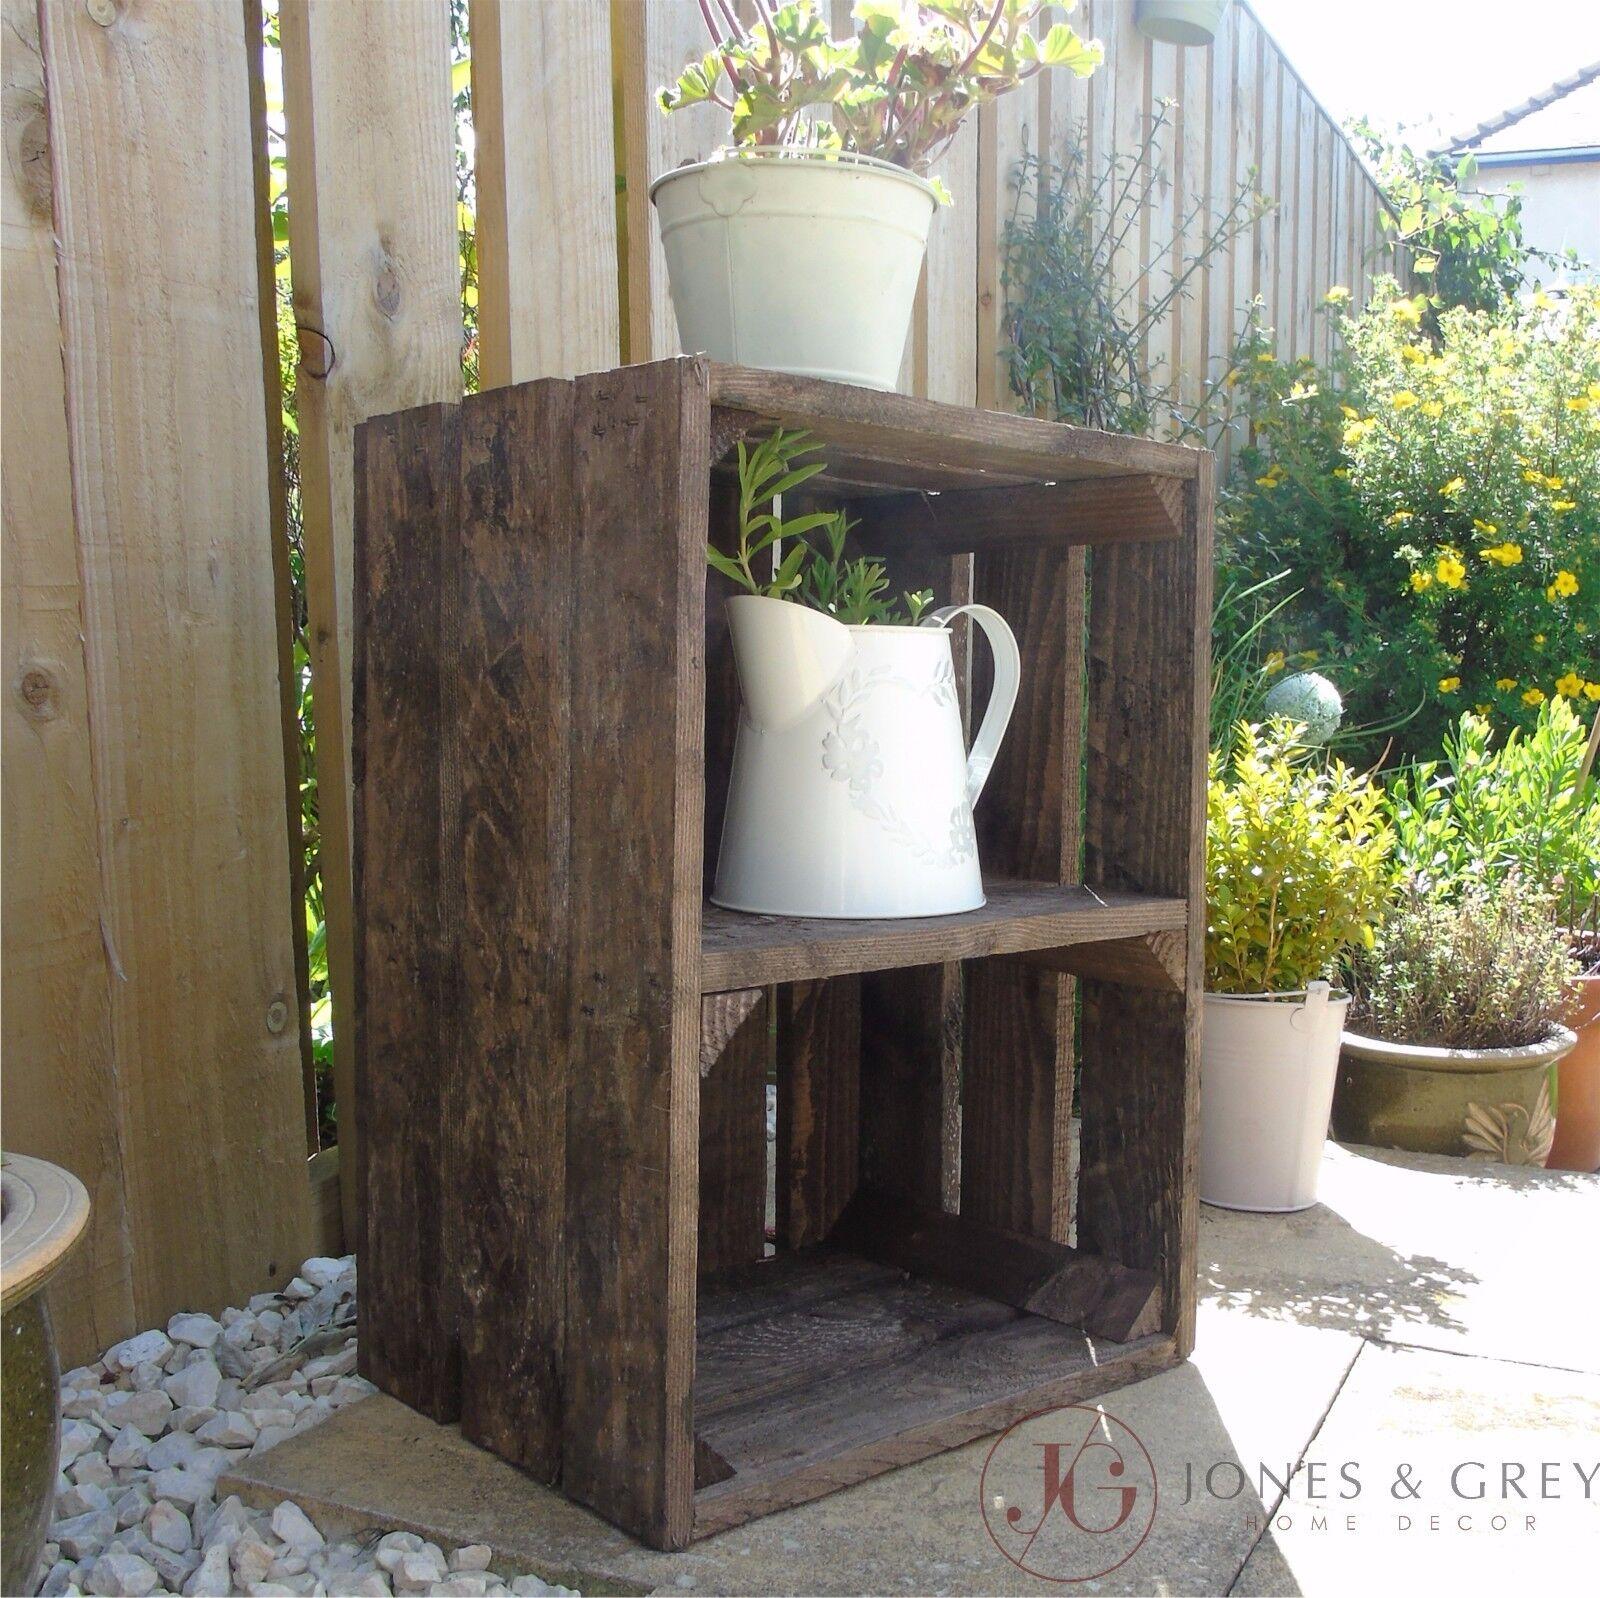 Vintage Apple Crate Fruit Crates Bushel Box Wooden Garden